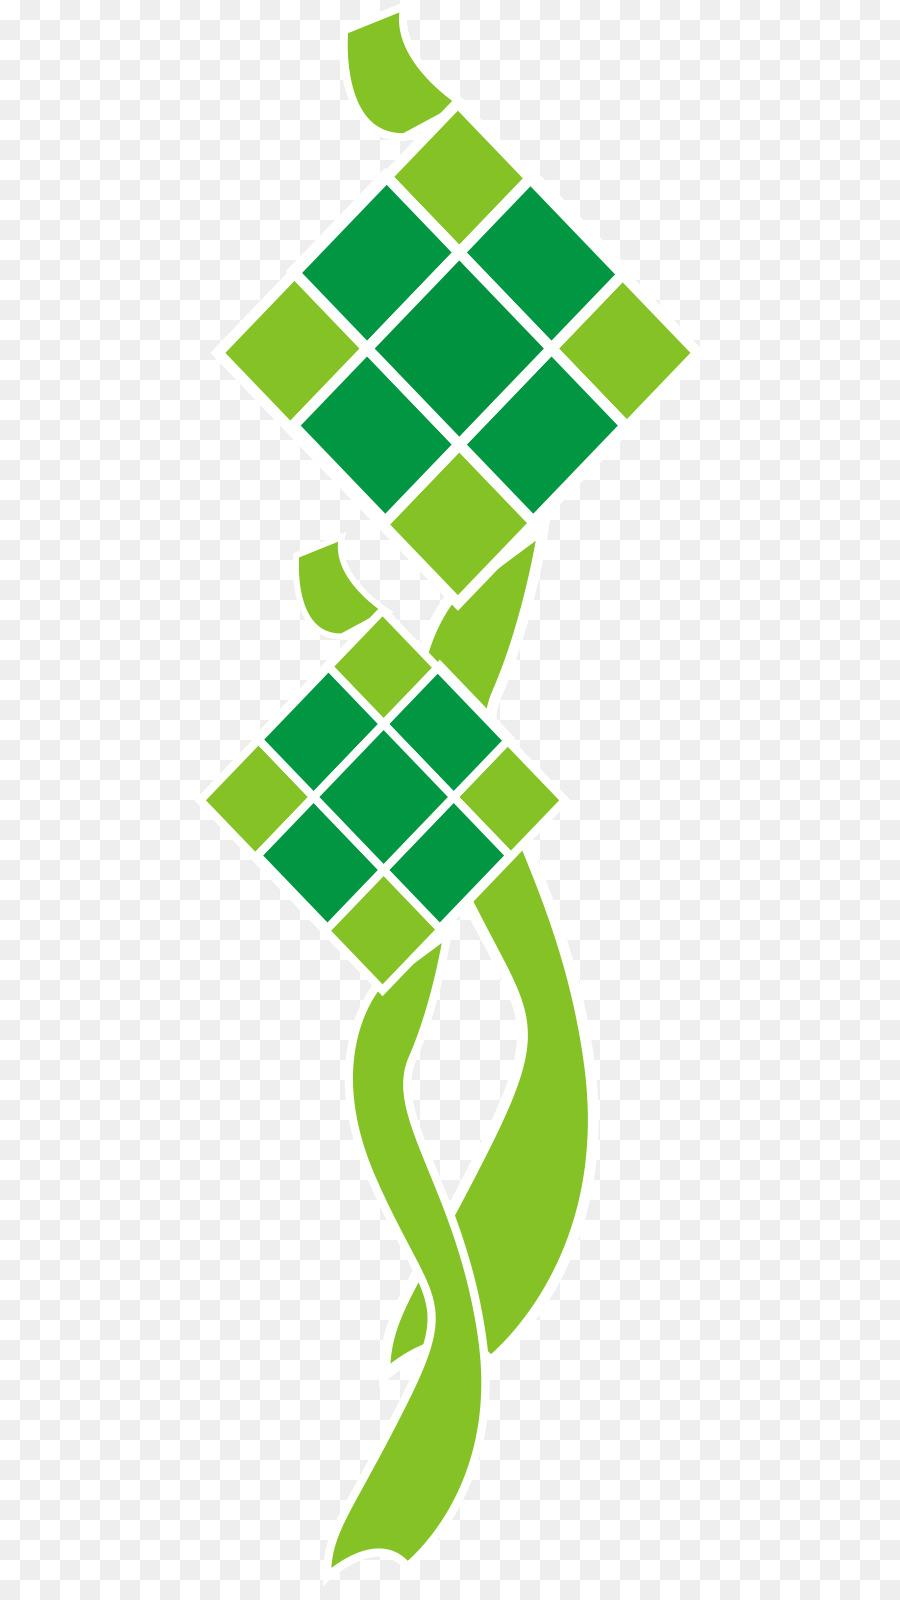 Gambar ketupat lebaran clipart svg royalty free library Clipart ketupat 7 » Clipart Station svg royalty free library